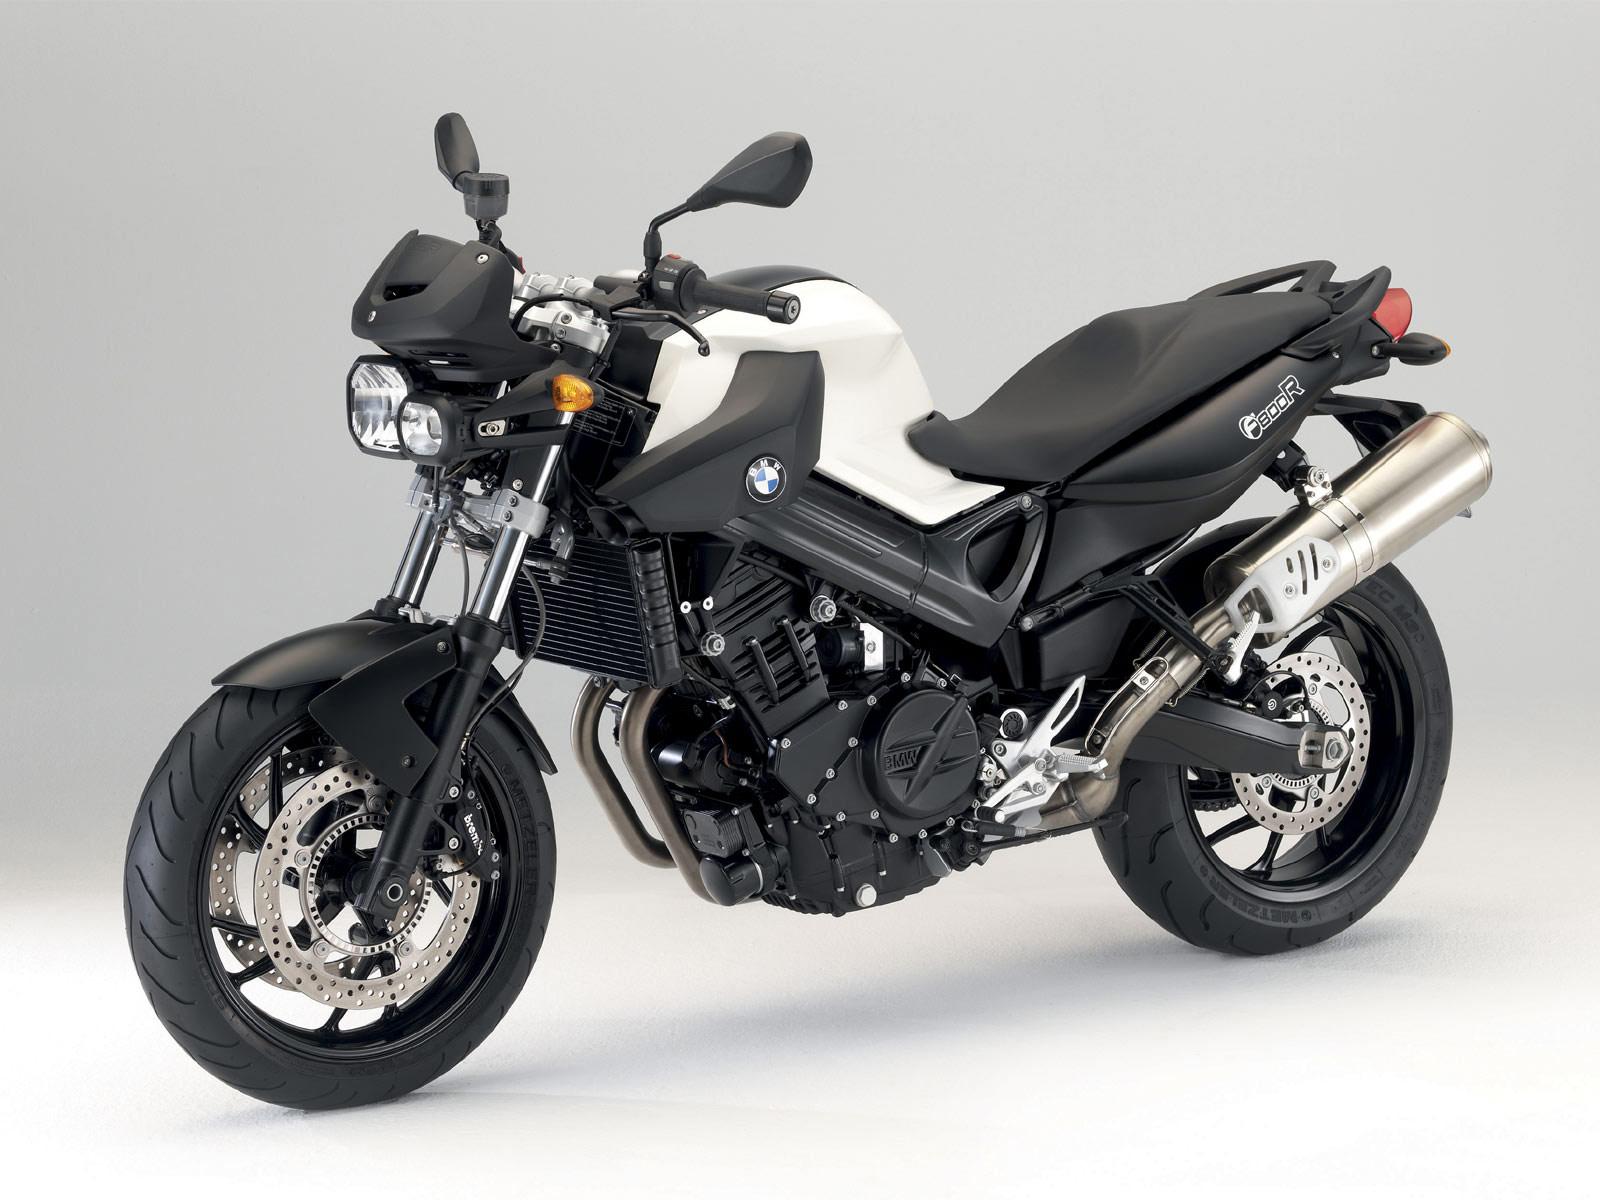 2008 BMW F 800 R motorcycle desktop wallpapers insurance 1600x1200